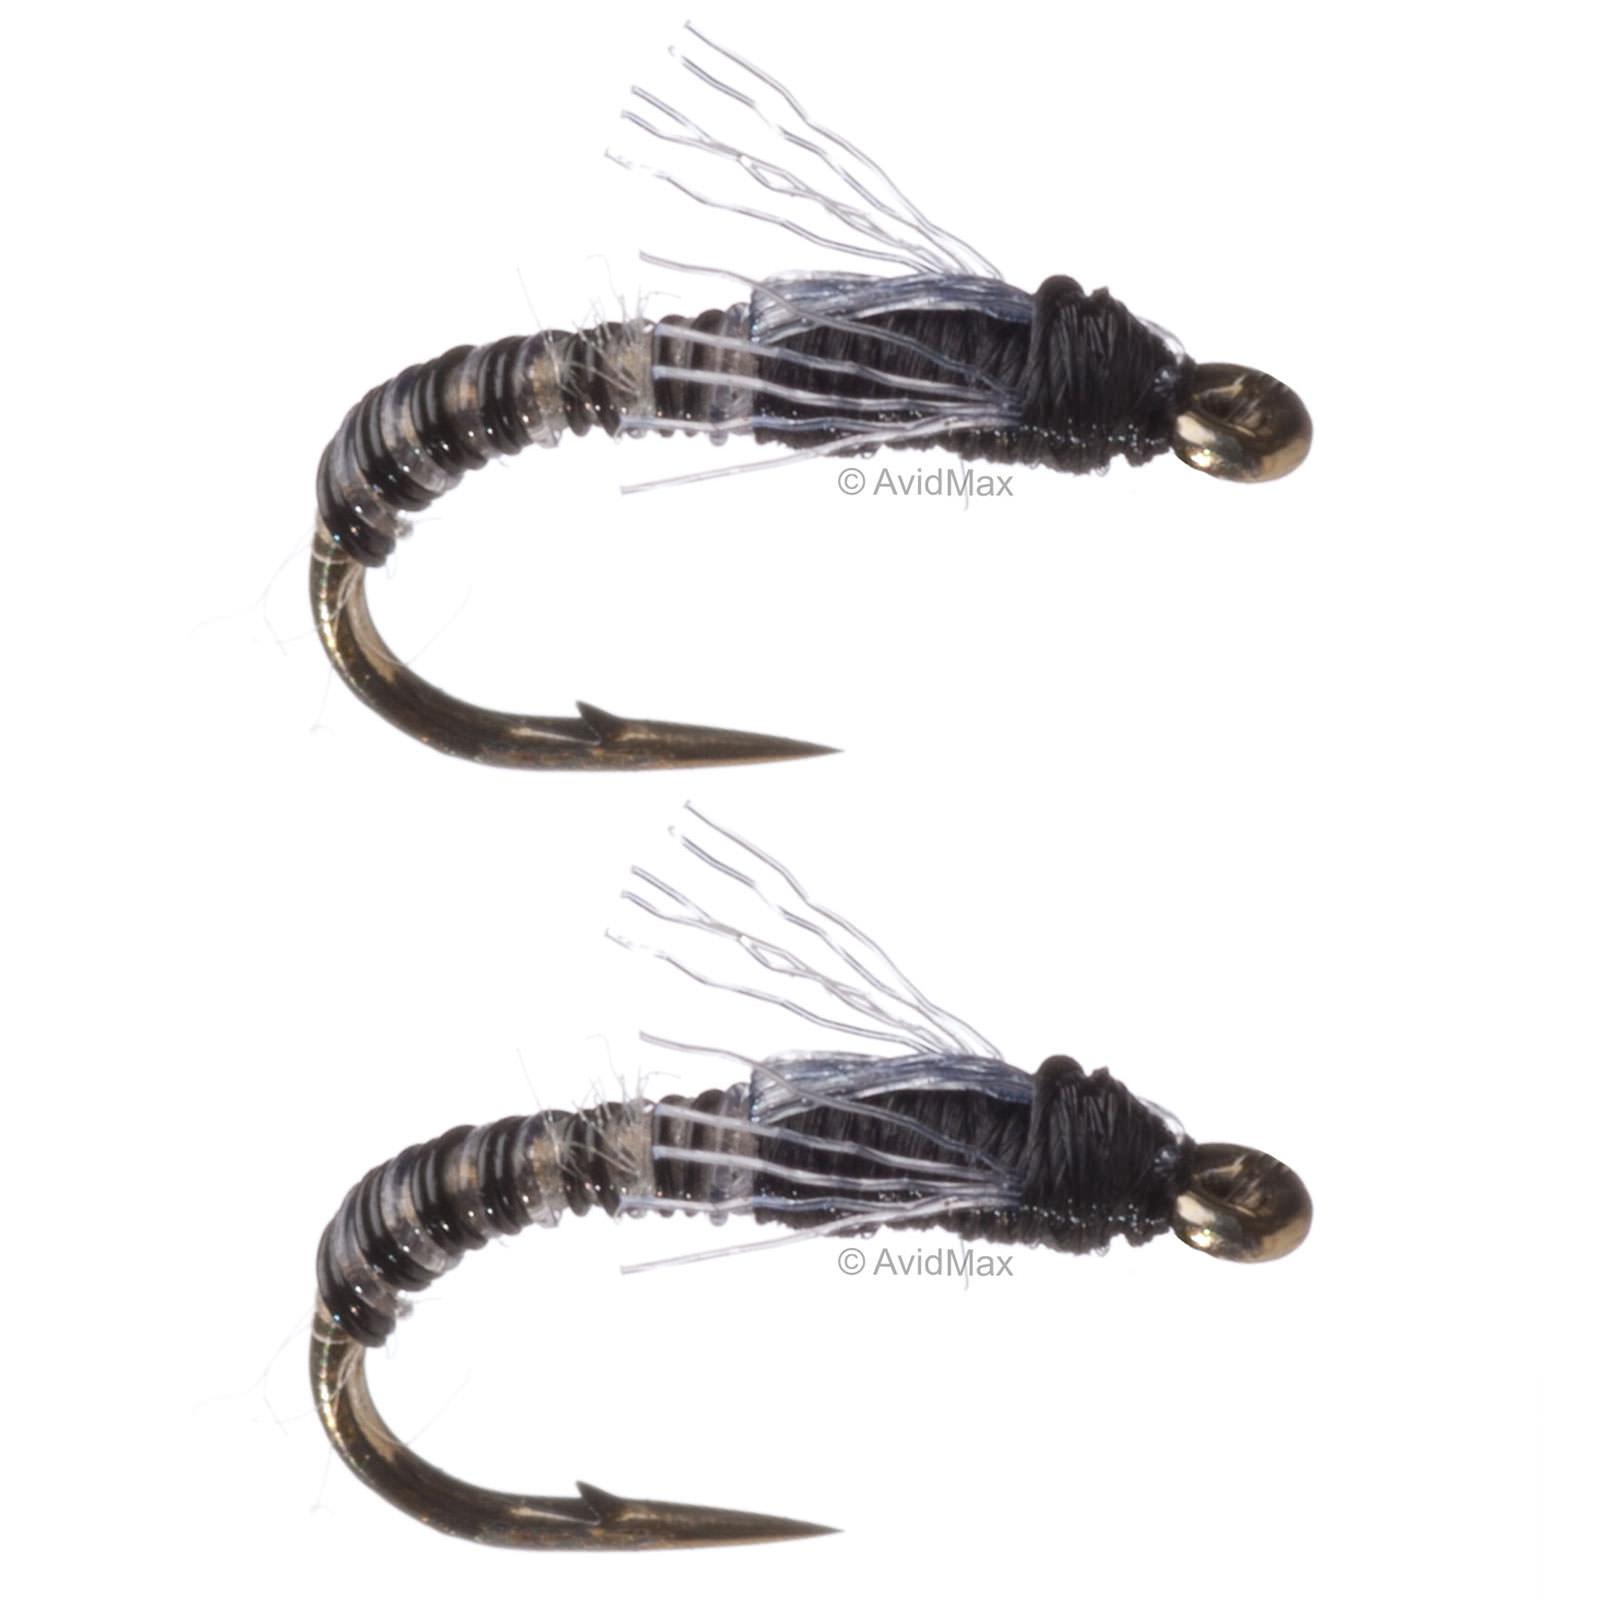 Umpqua craven 39 s jujubee midge zebra fly fishing midges for Midge fly fishing